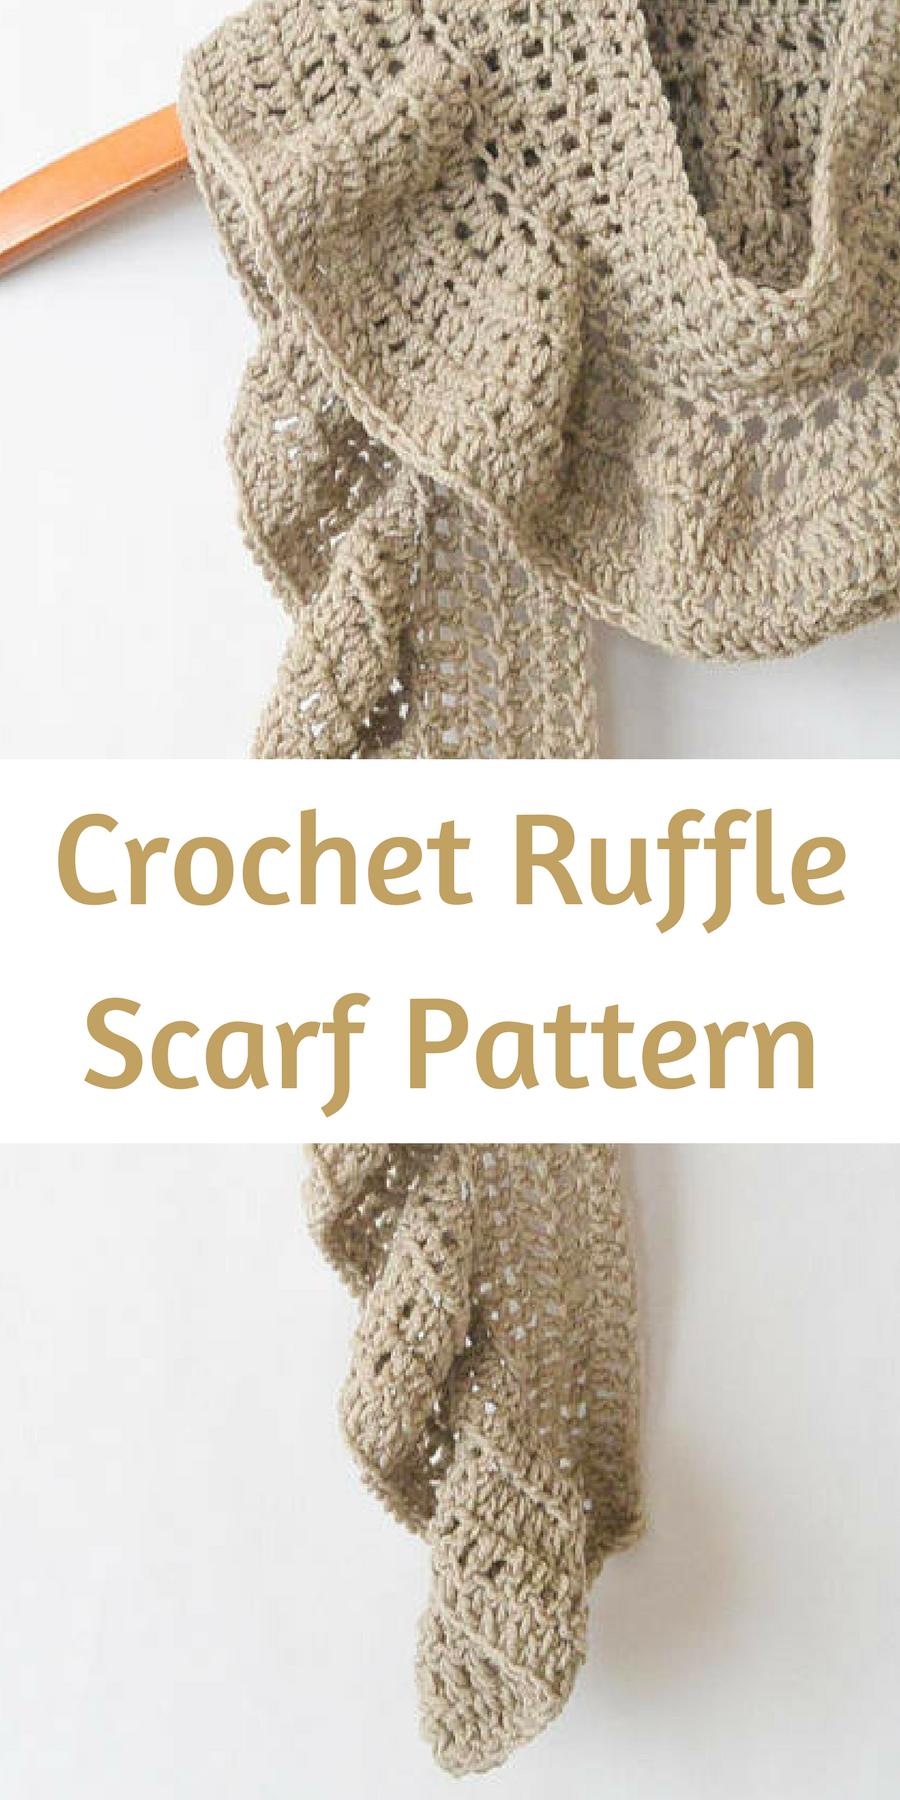 Lovely little ruffle crochet scarf pattern - the ruffle adds a ...